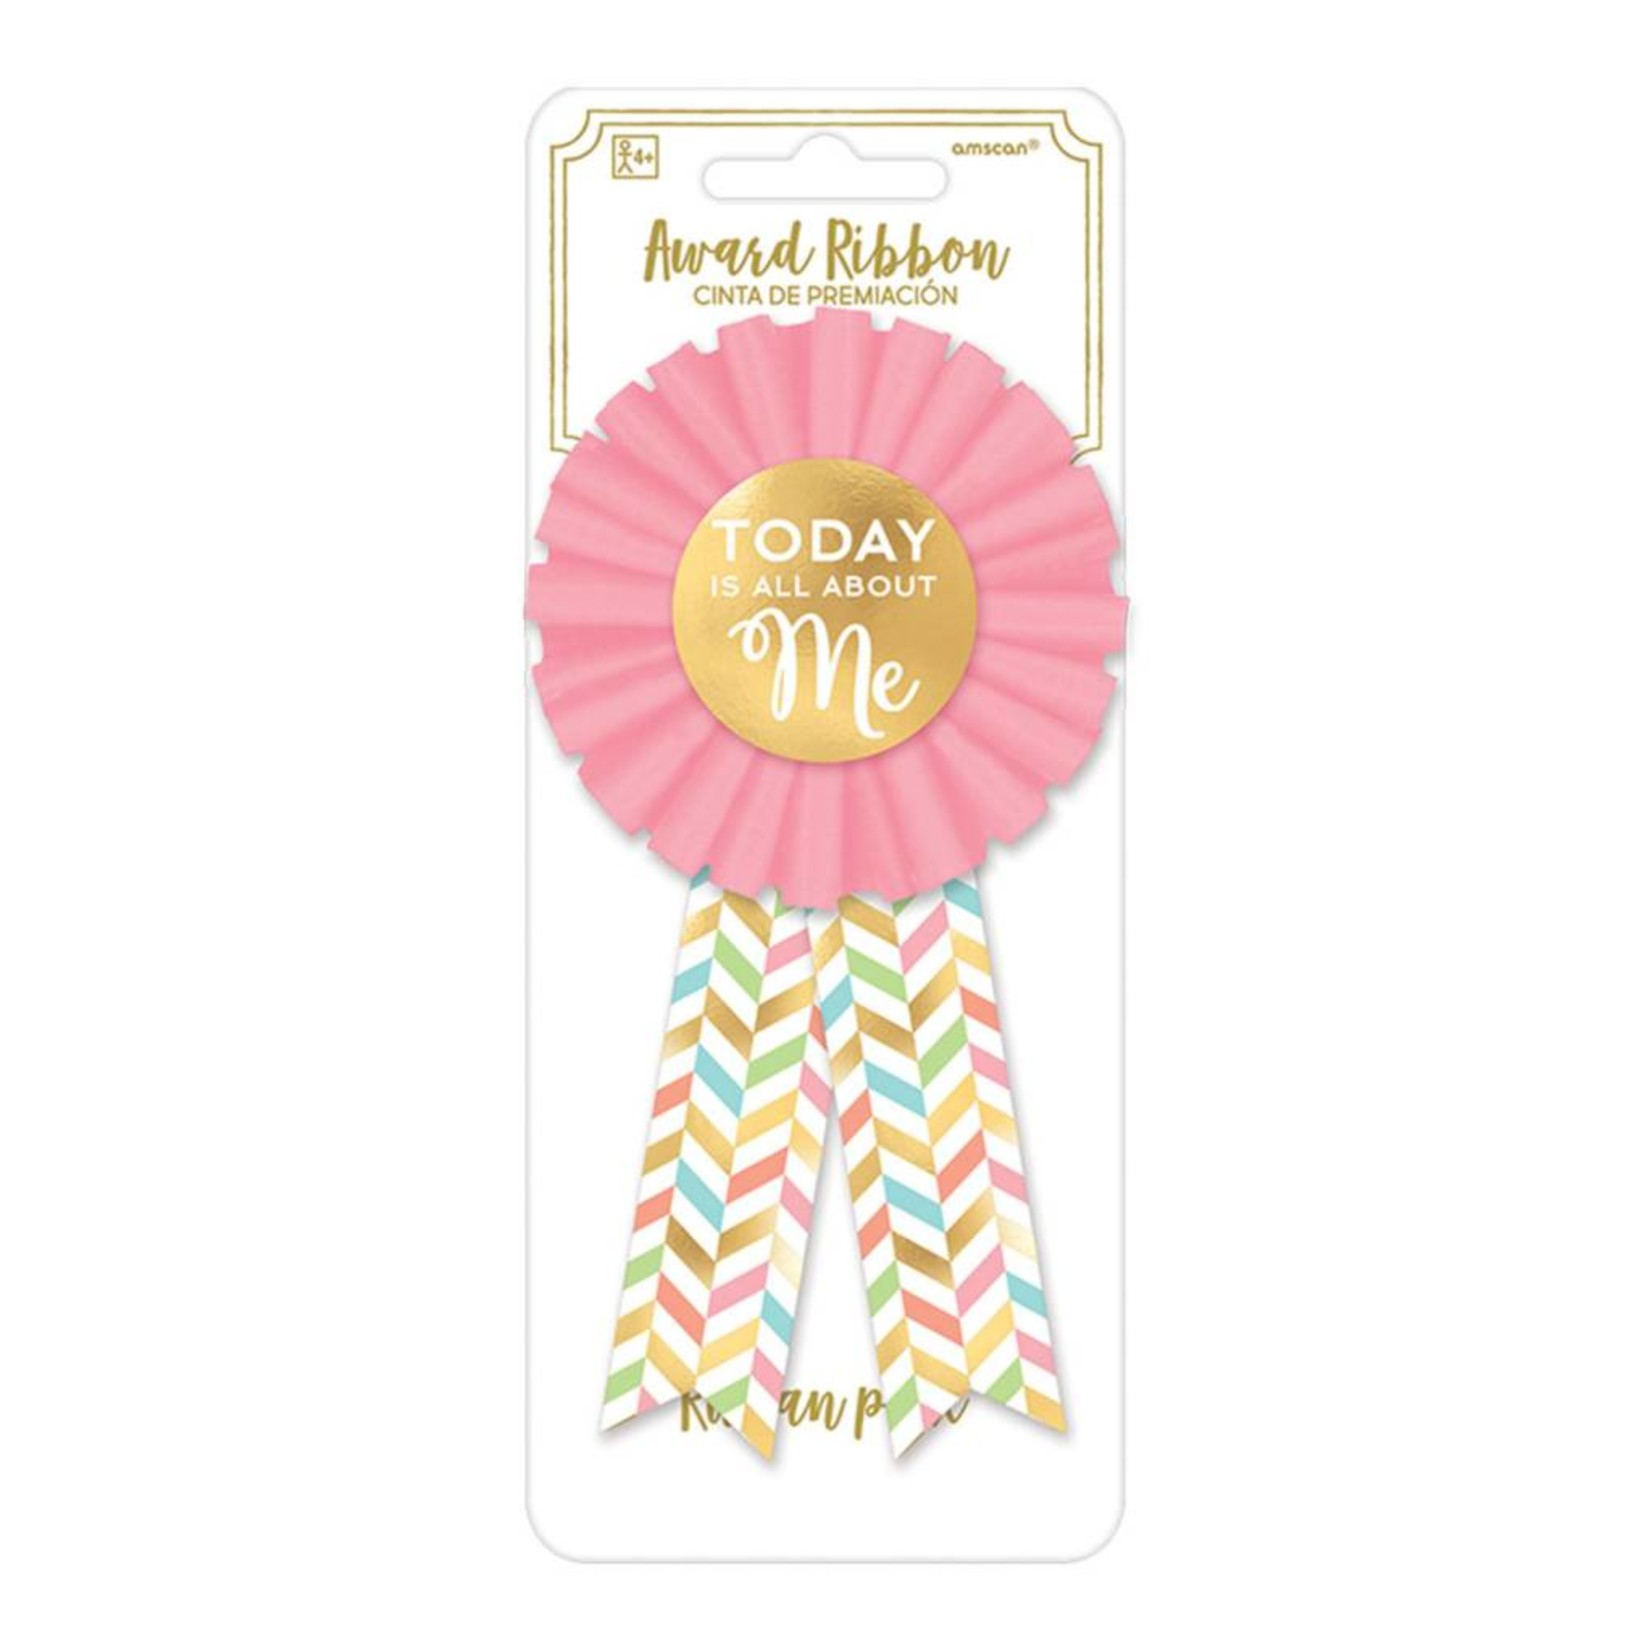 Award Ribbon- Confetti Fun- 1pc